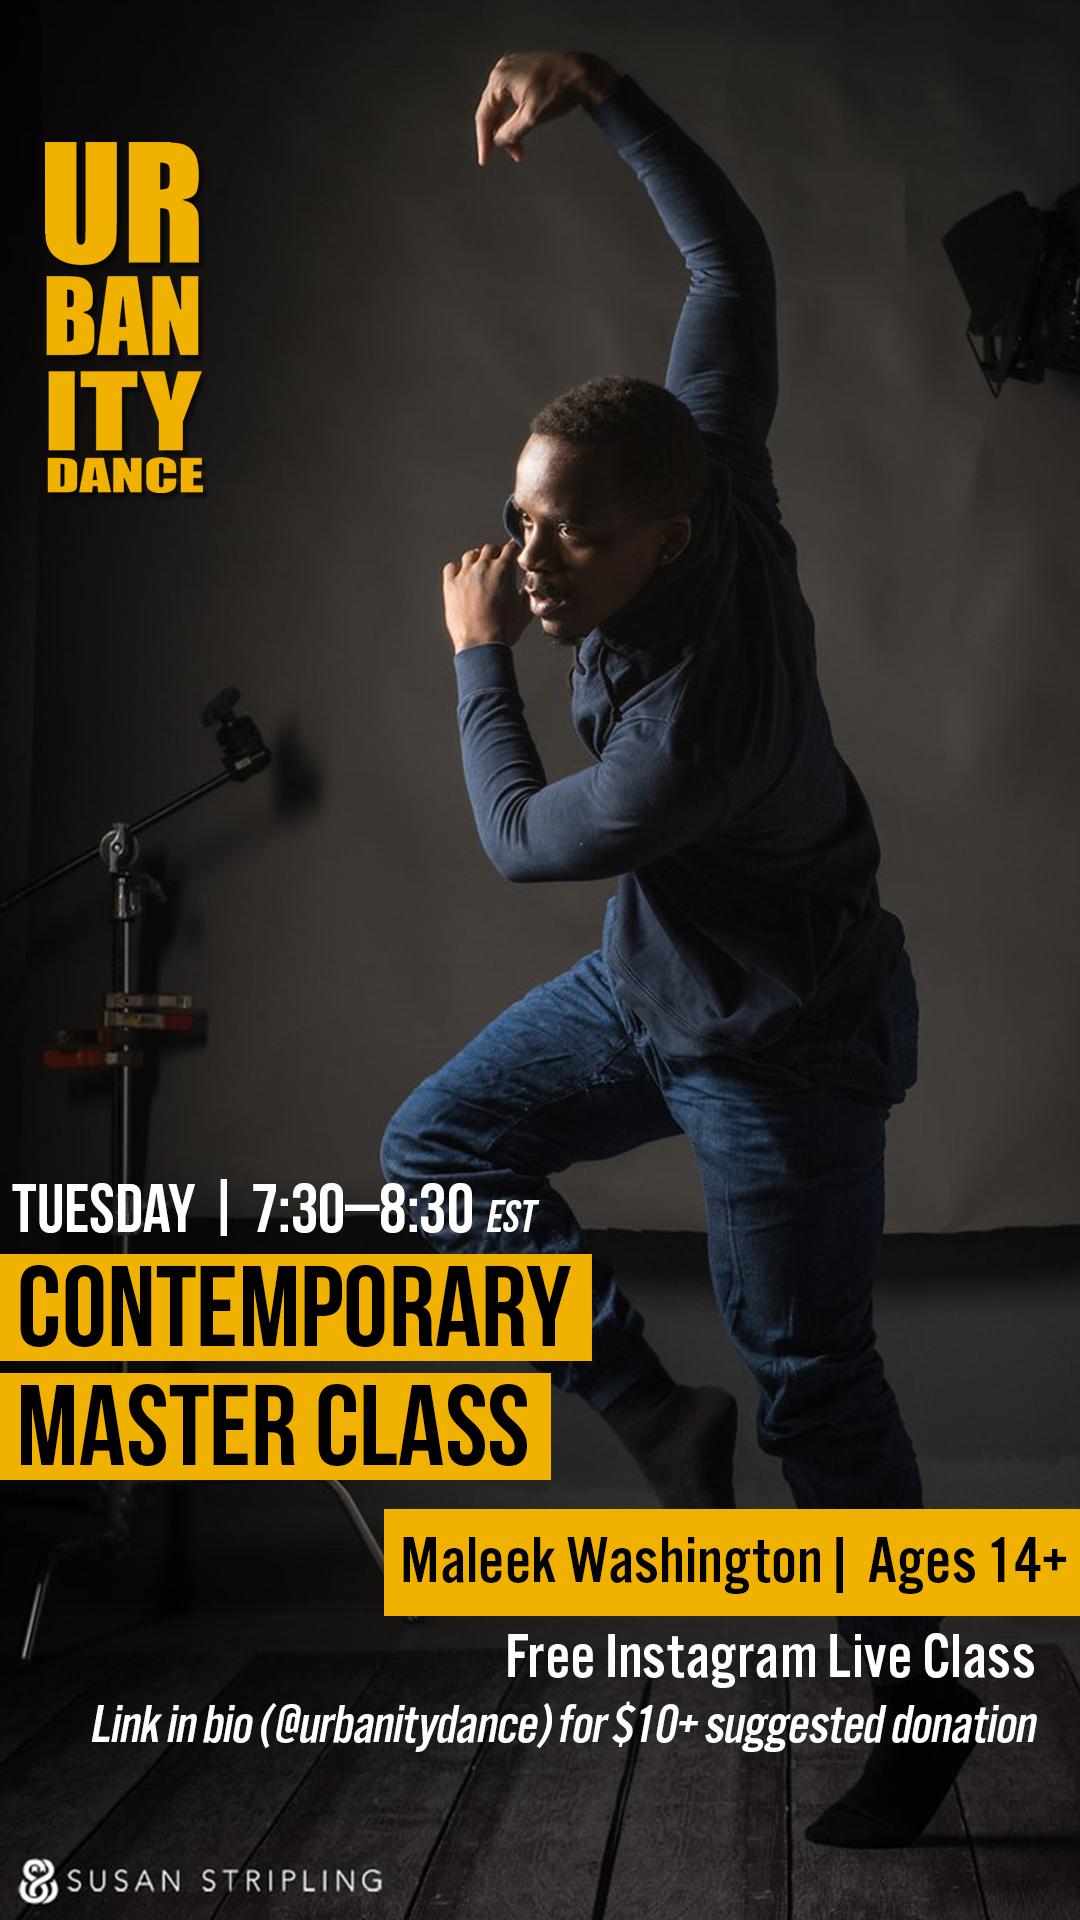 Urbanity Dance Master Class with Maleek Washington